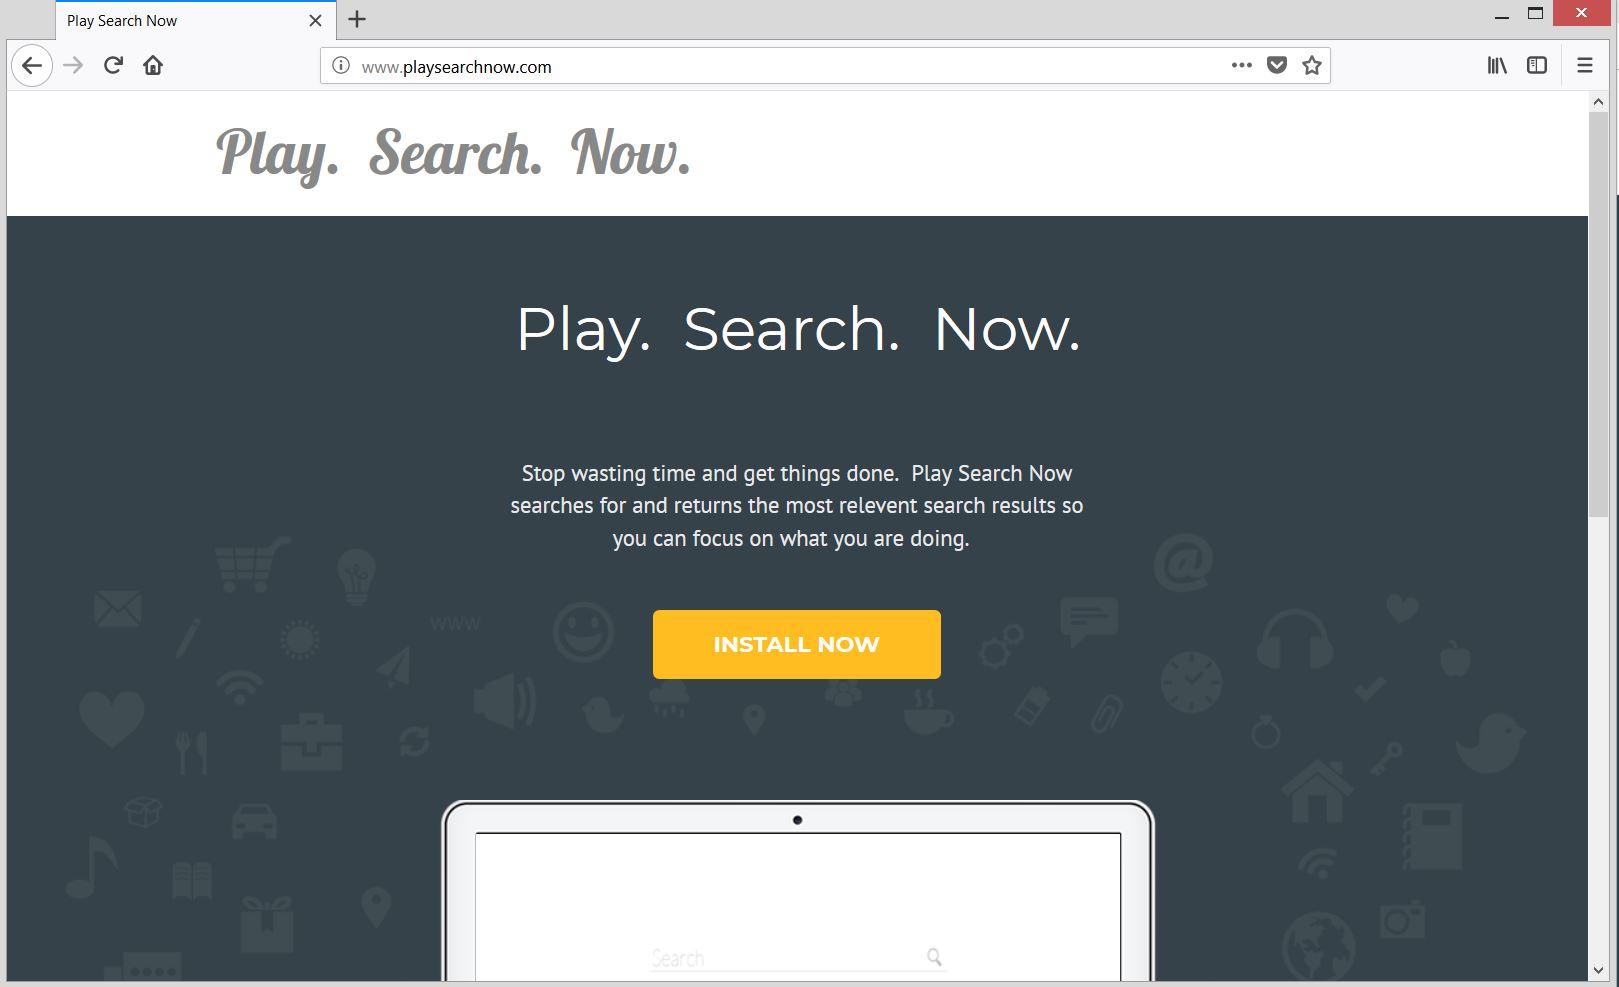 play search now PUP official website sensorstechforum